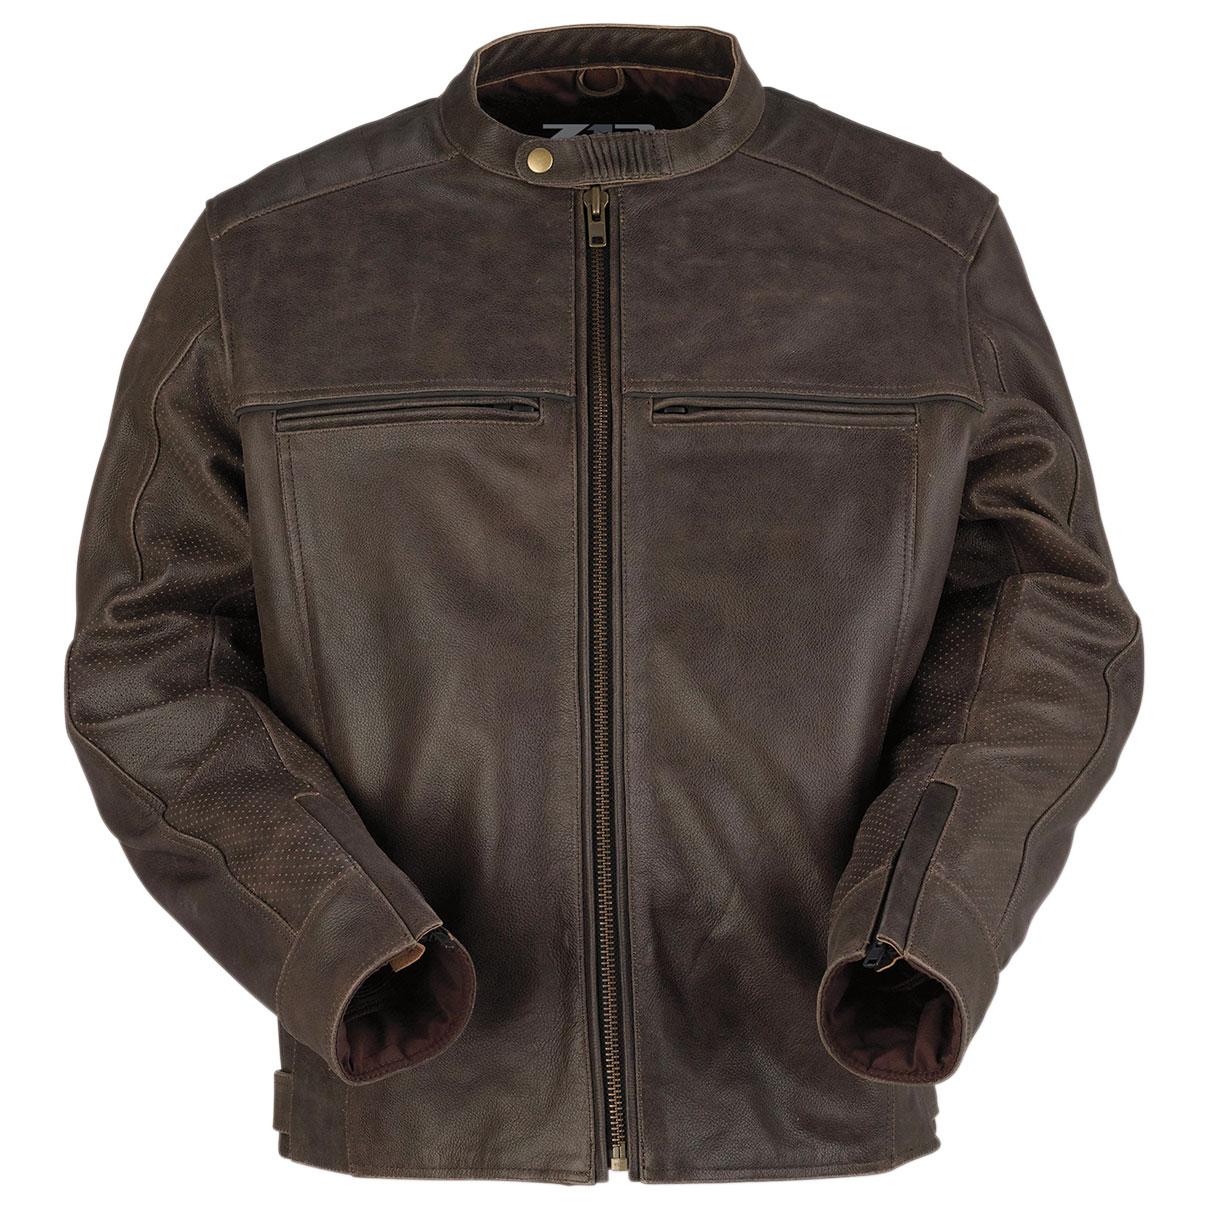 Z1R Men's Indiana Brown Leather Jacket